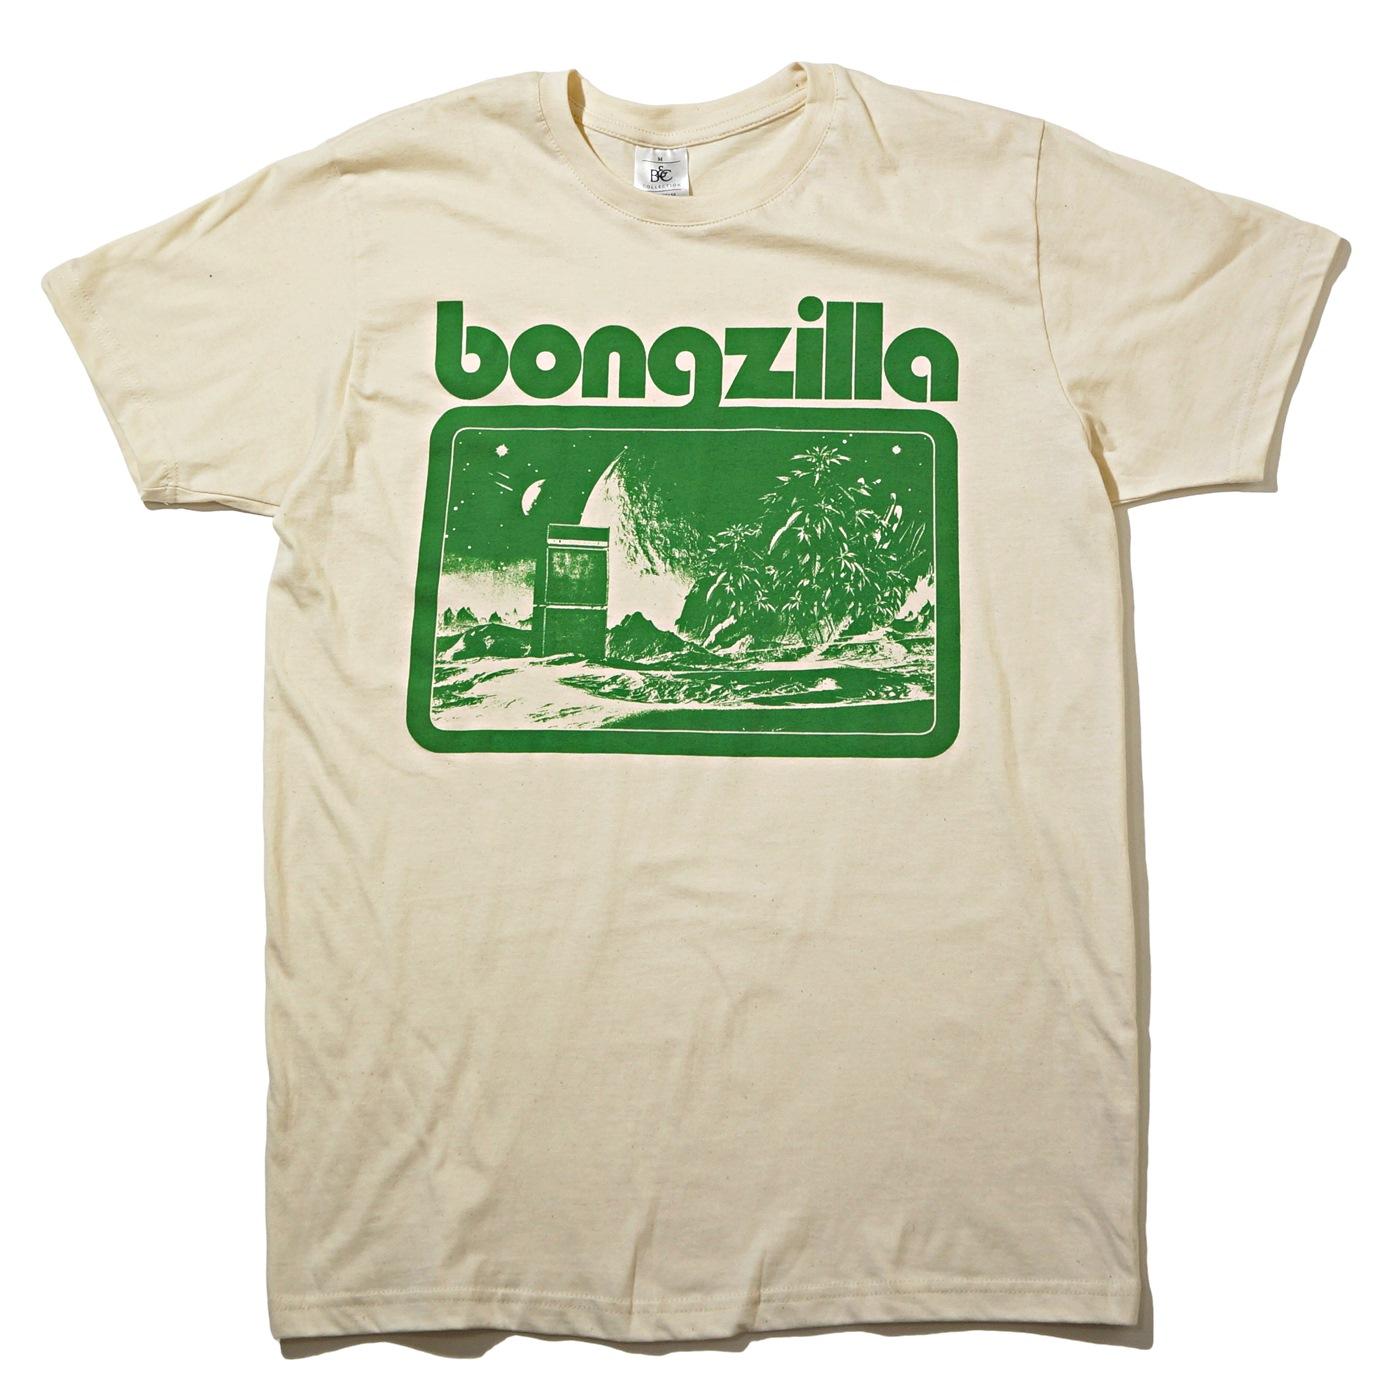 BONGZILLA Tシャツ Space Amp Weed-Natural/Green